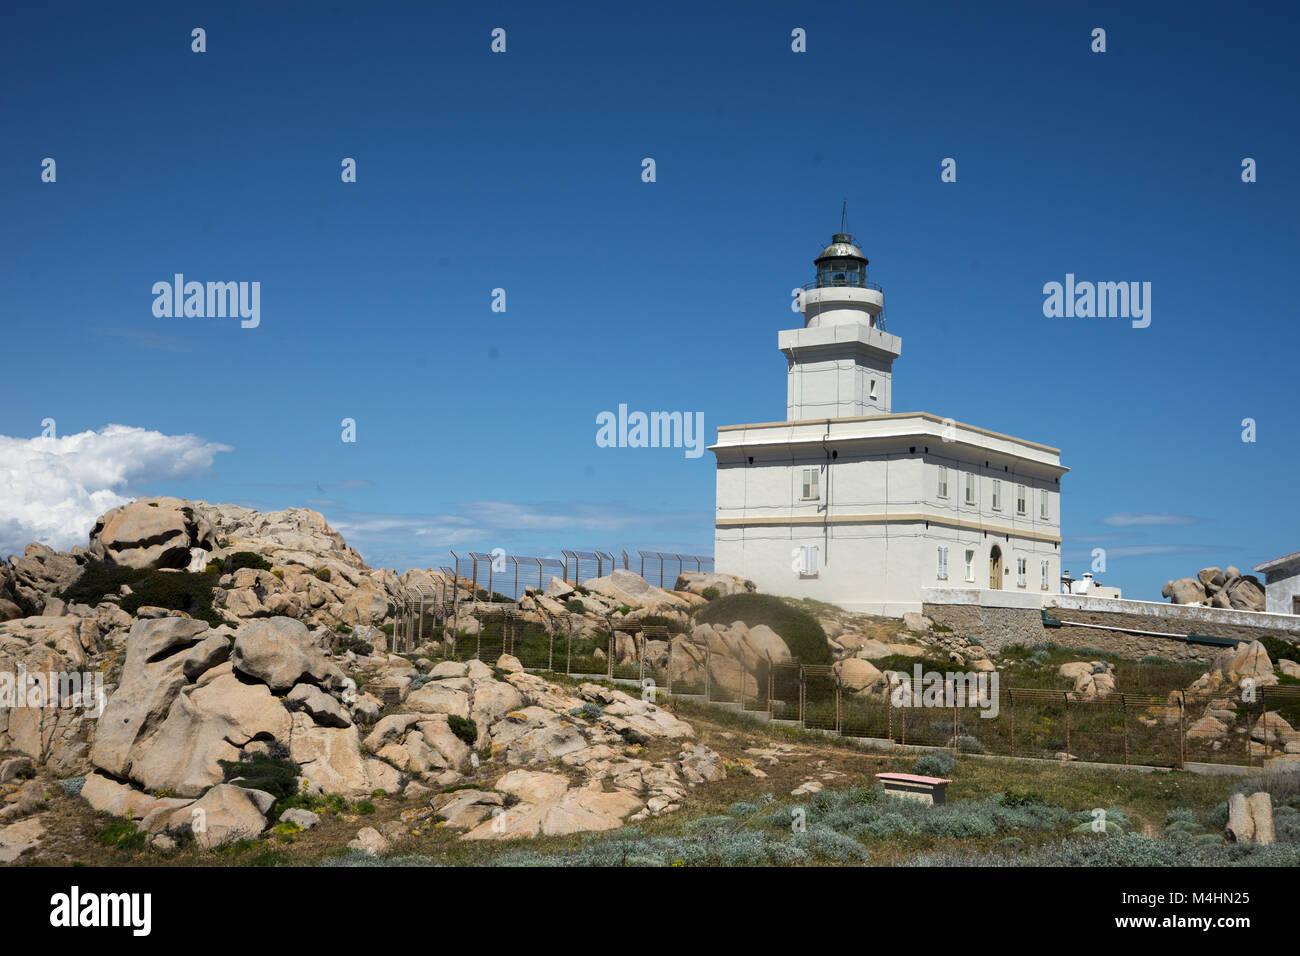 Lighttower at Capo Testa Stock Photo